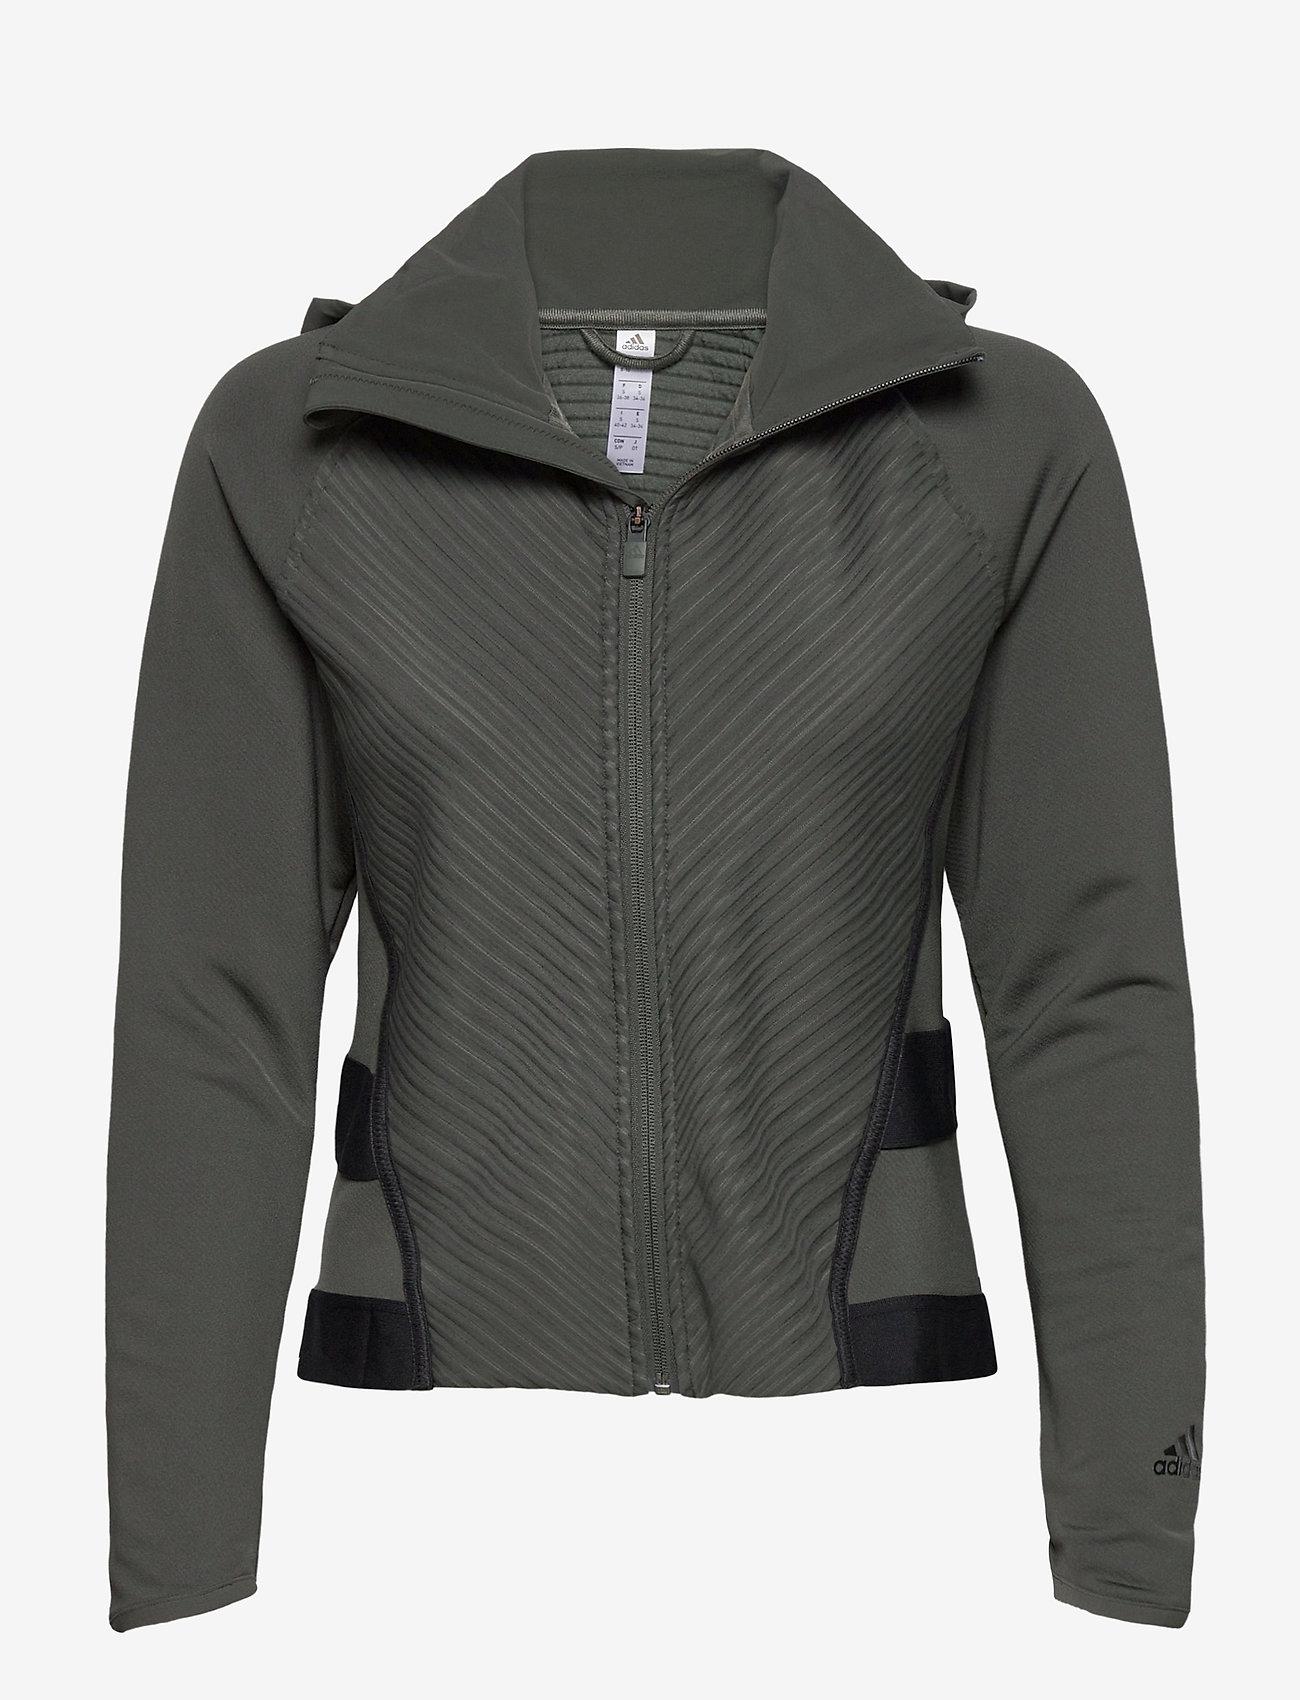 adidas Performance - T JKT C.RDY - training jackets - legear - 1